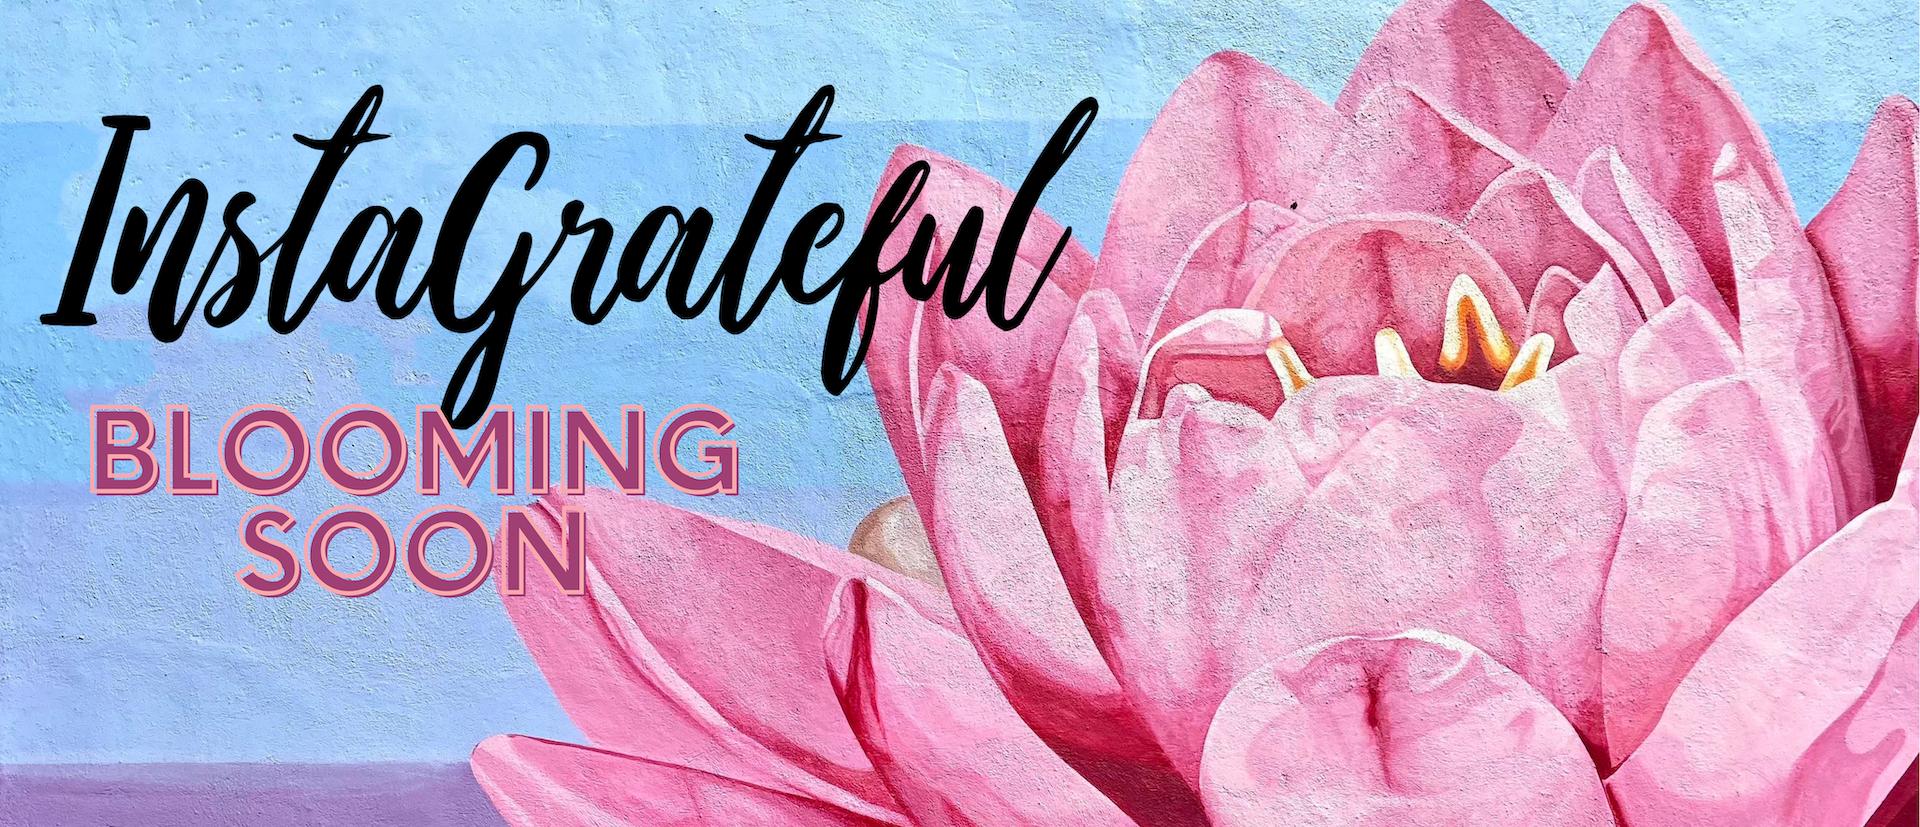 InstaGrateful by Sheri Fink: Blooming Soon